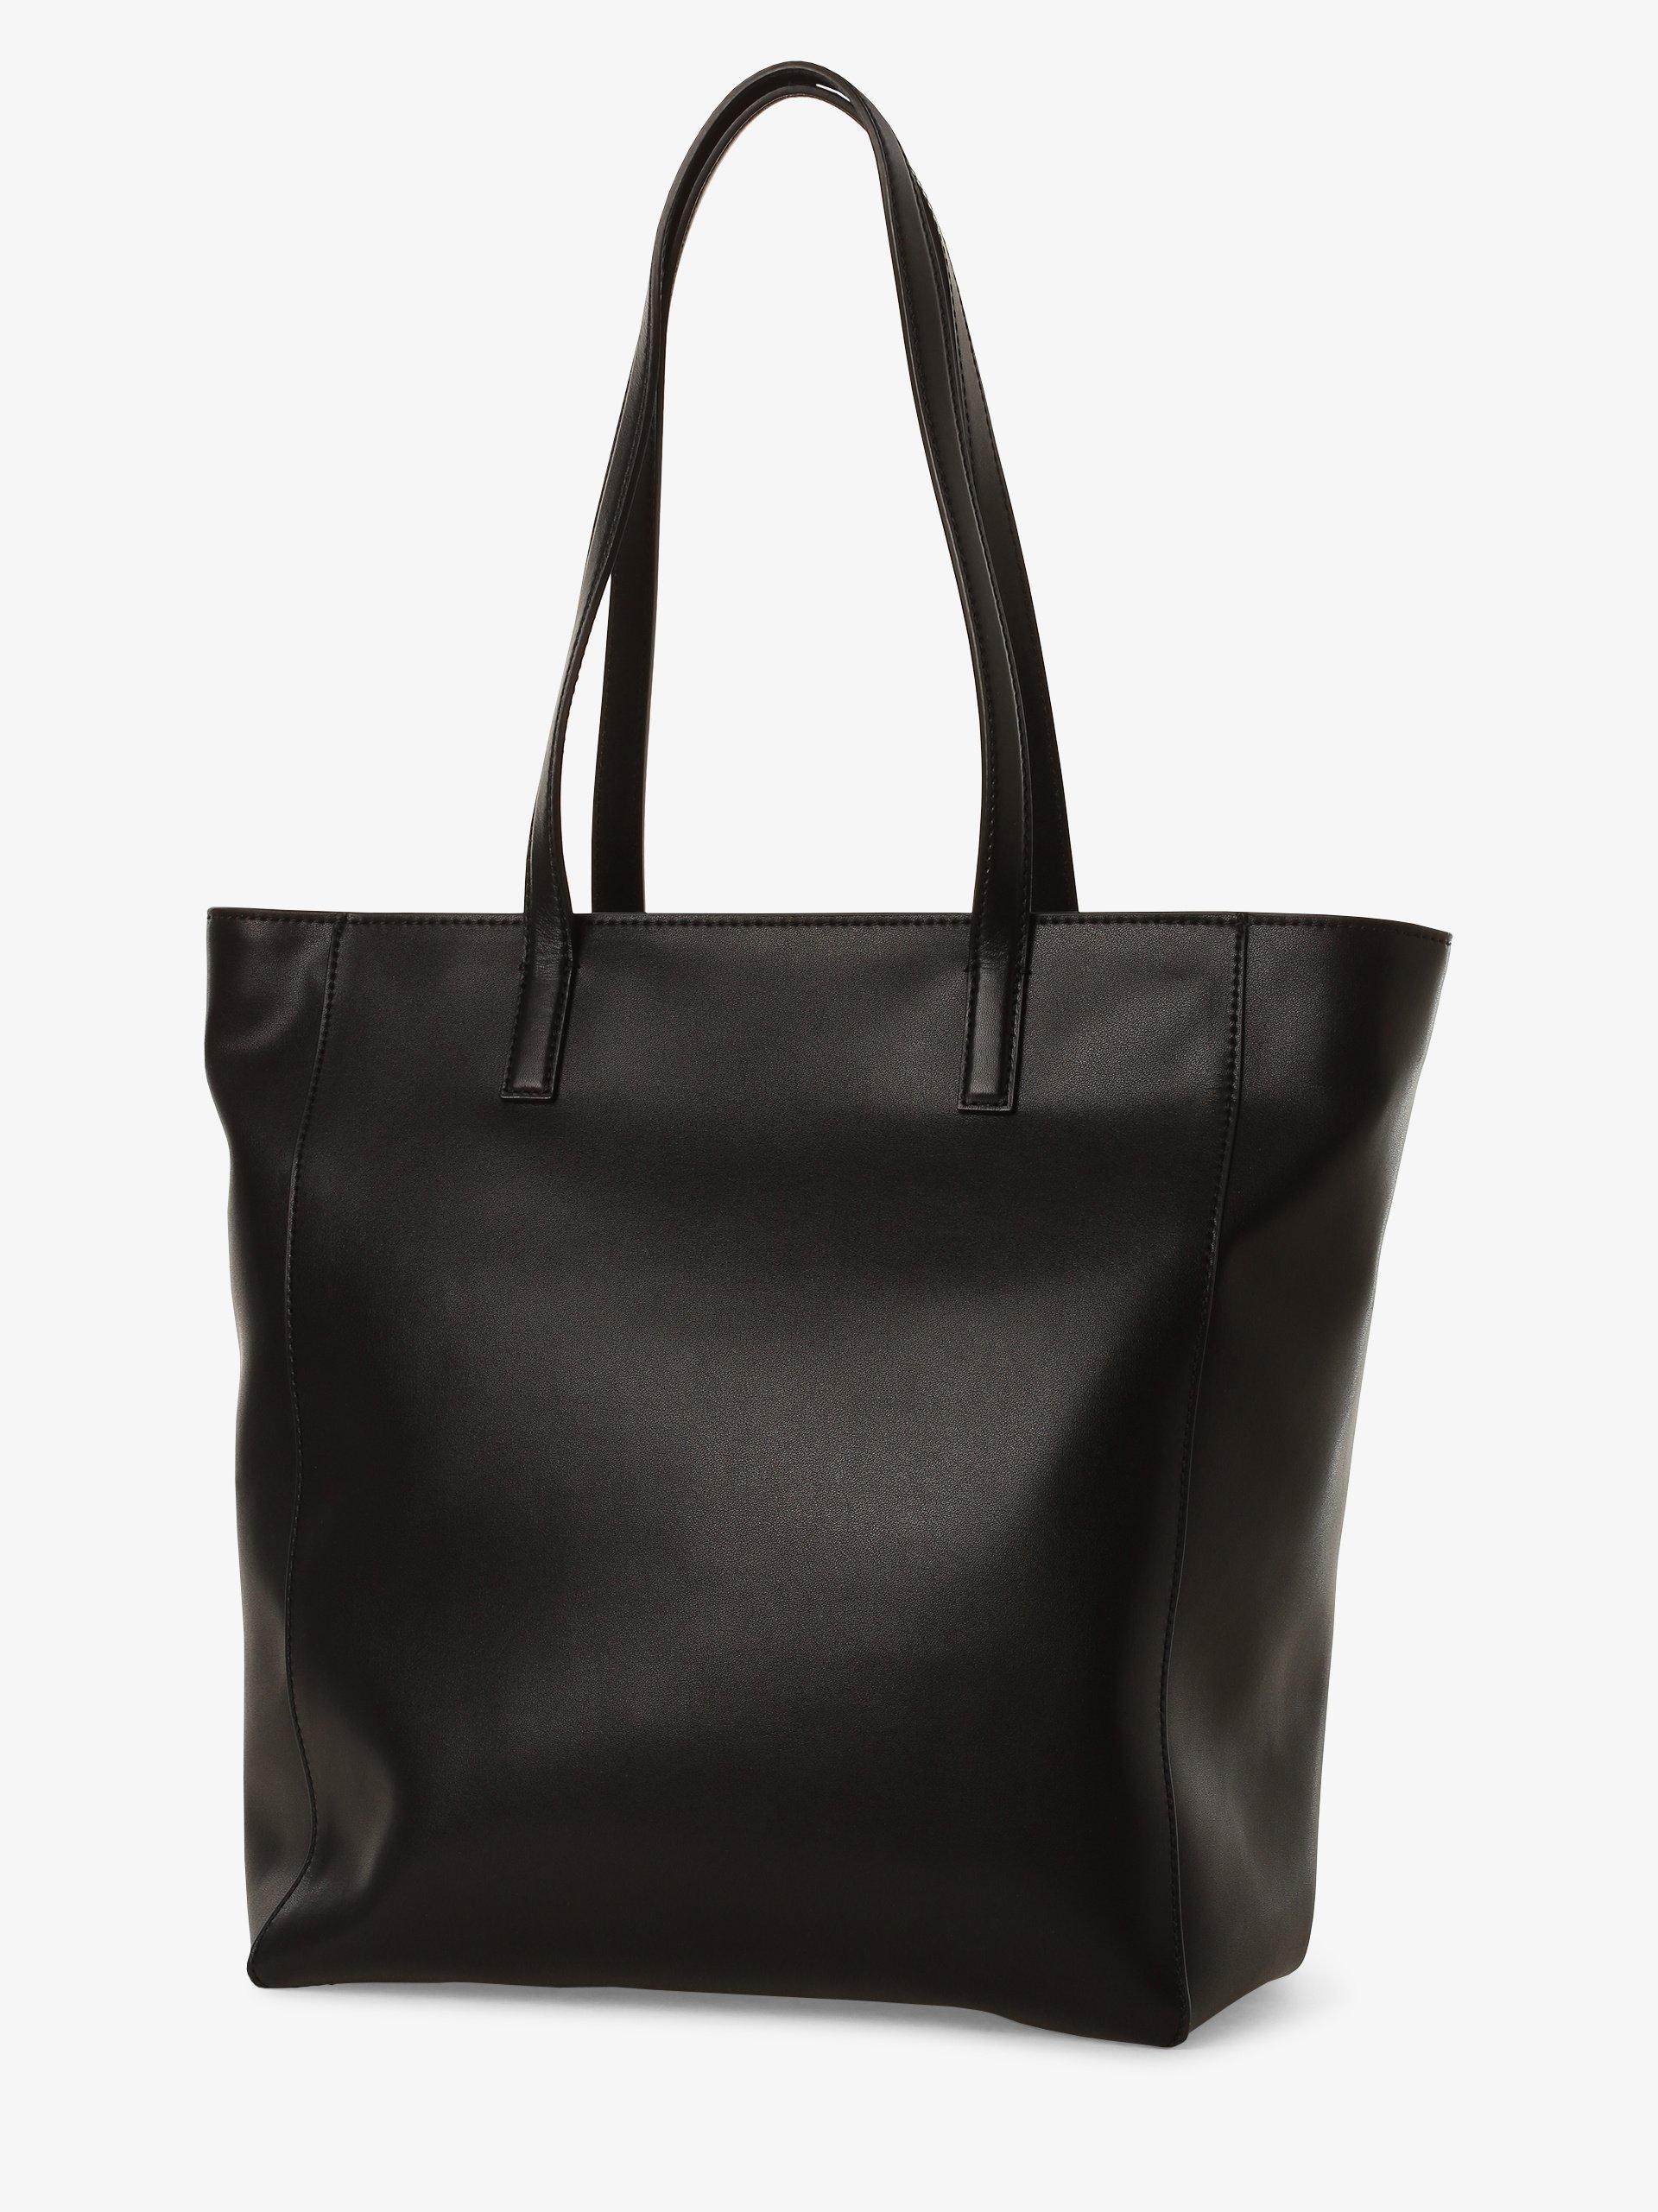 KARL LAGERFELD Damska torba shopper z dodatkiem skóry